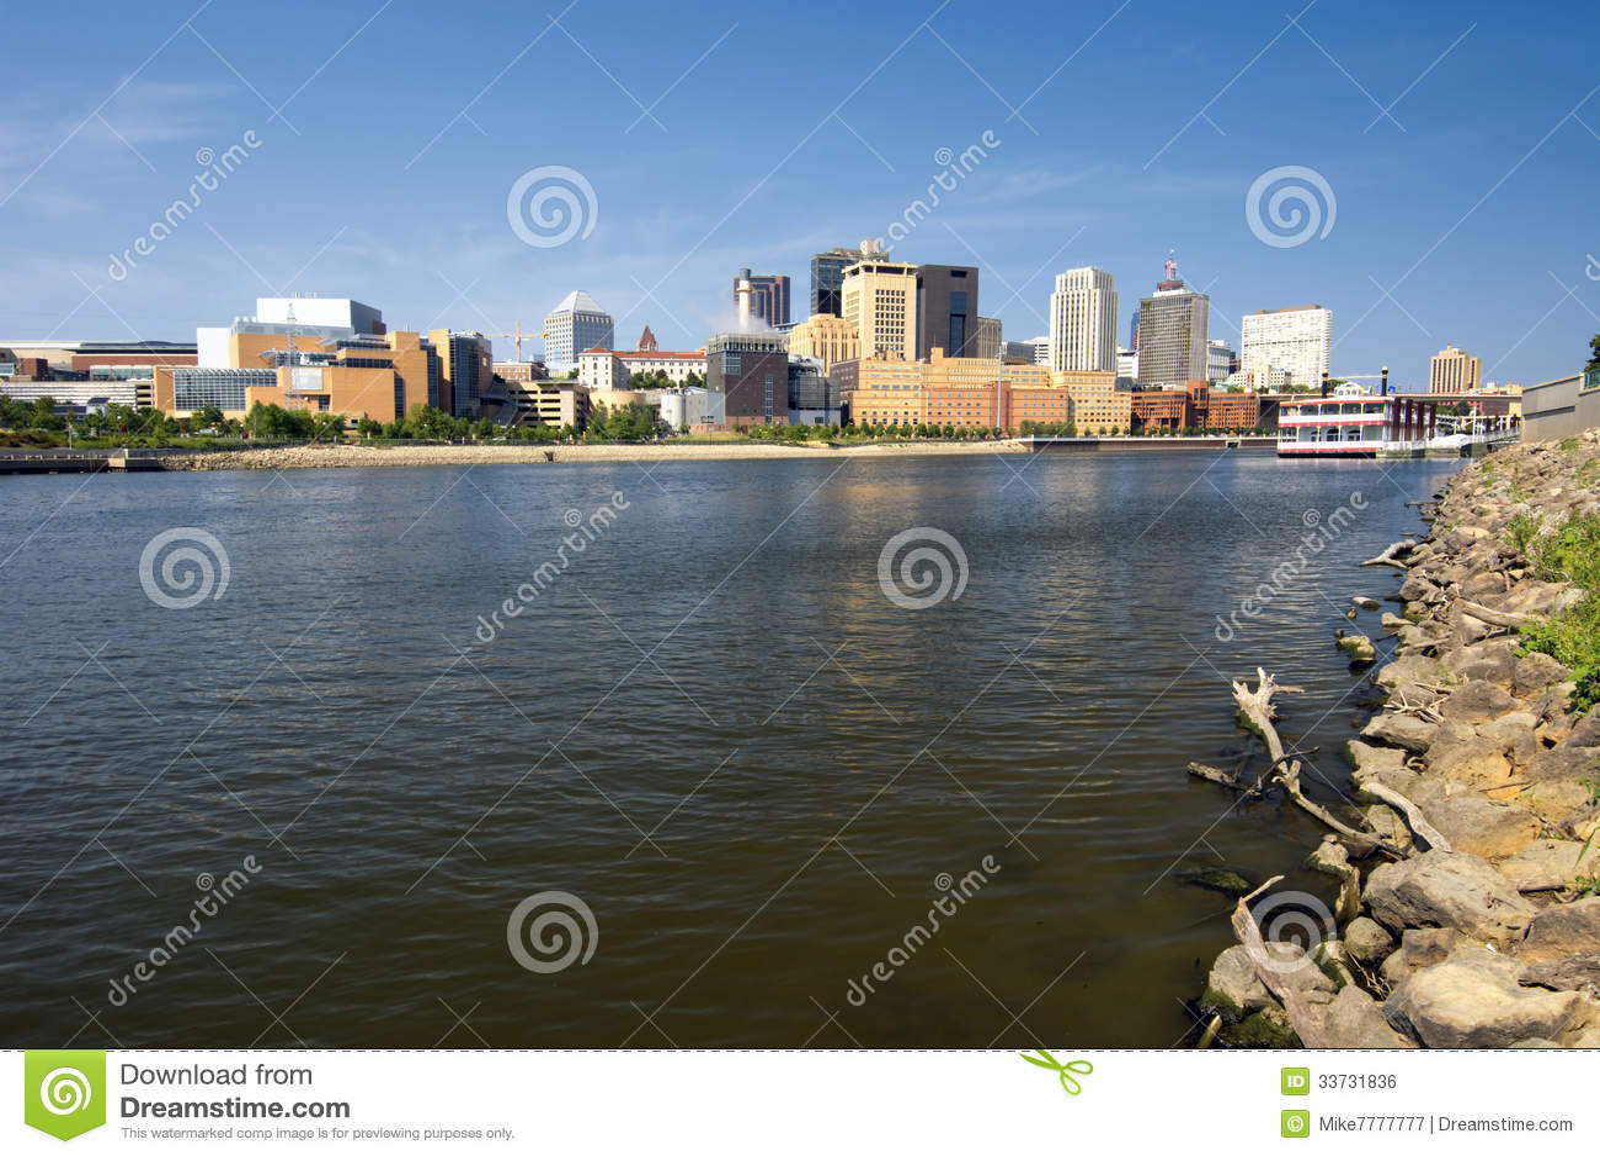 Горизонт St Paul, река Миссисипи, St Paul, Минесота, США